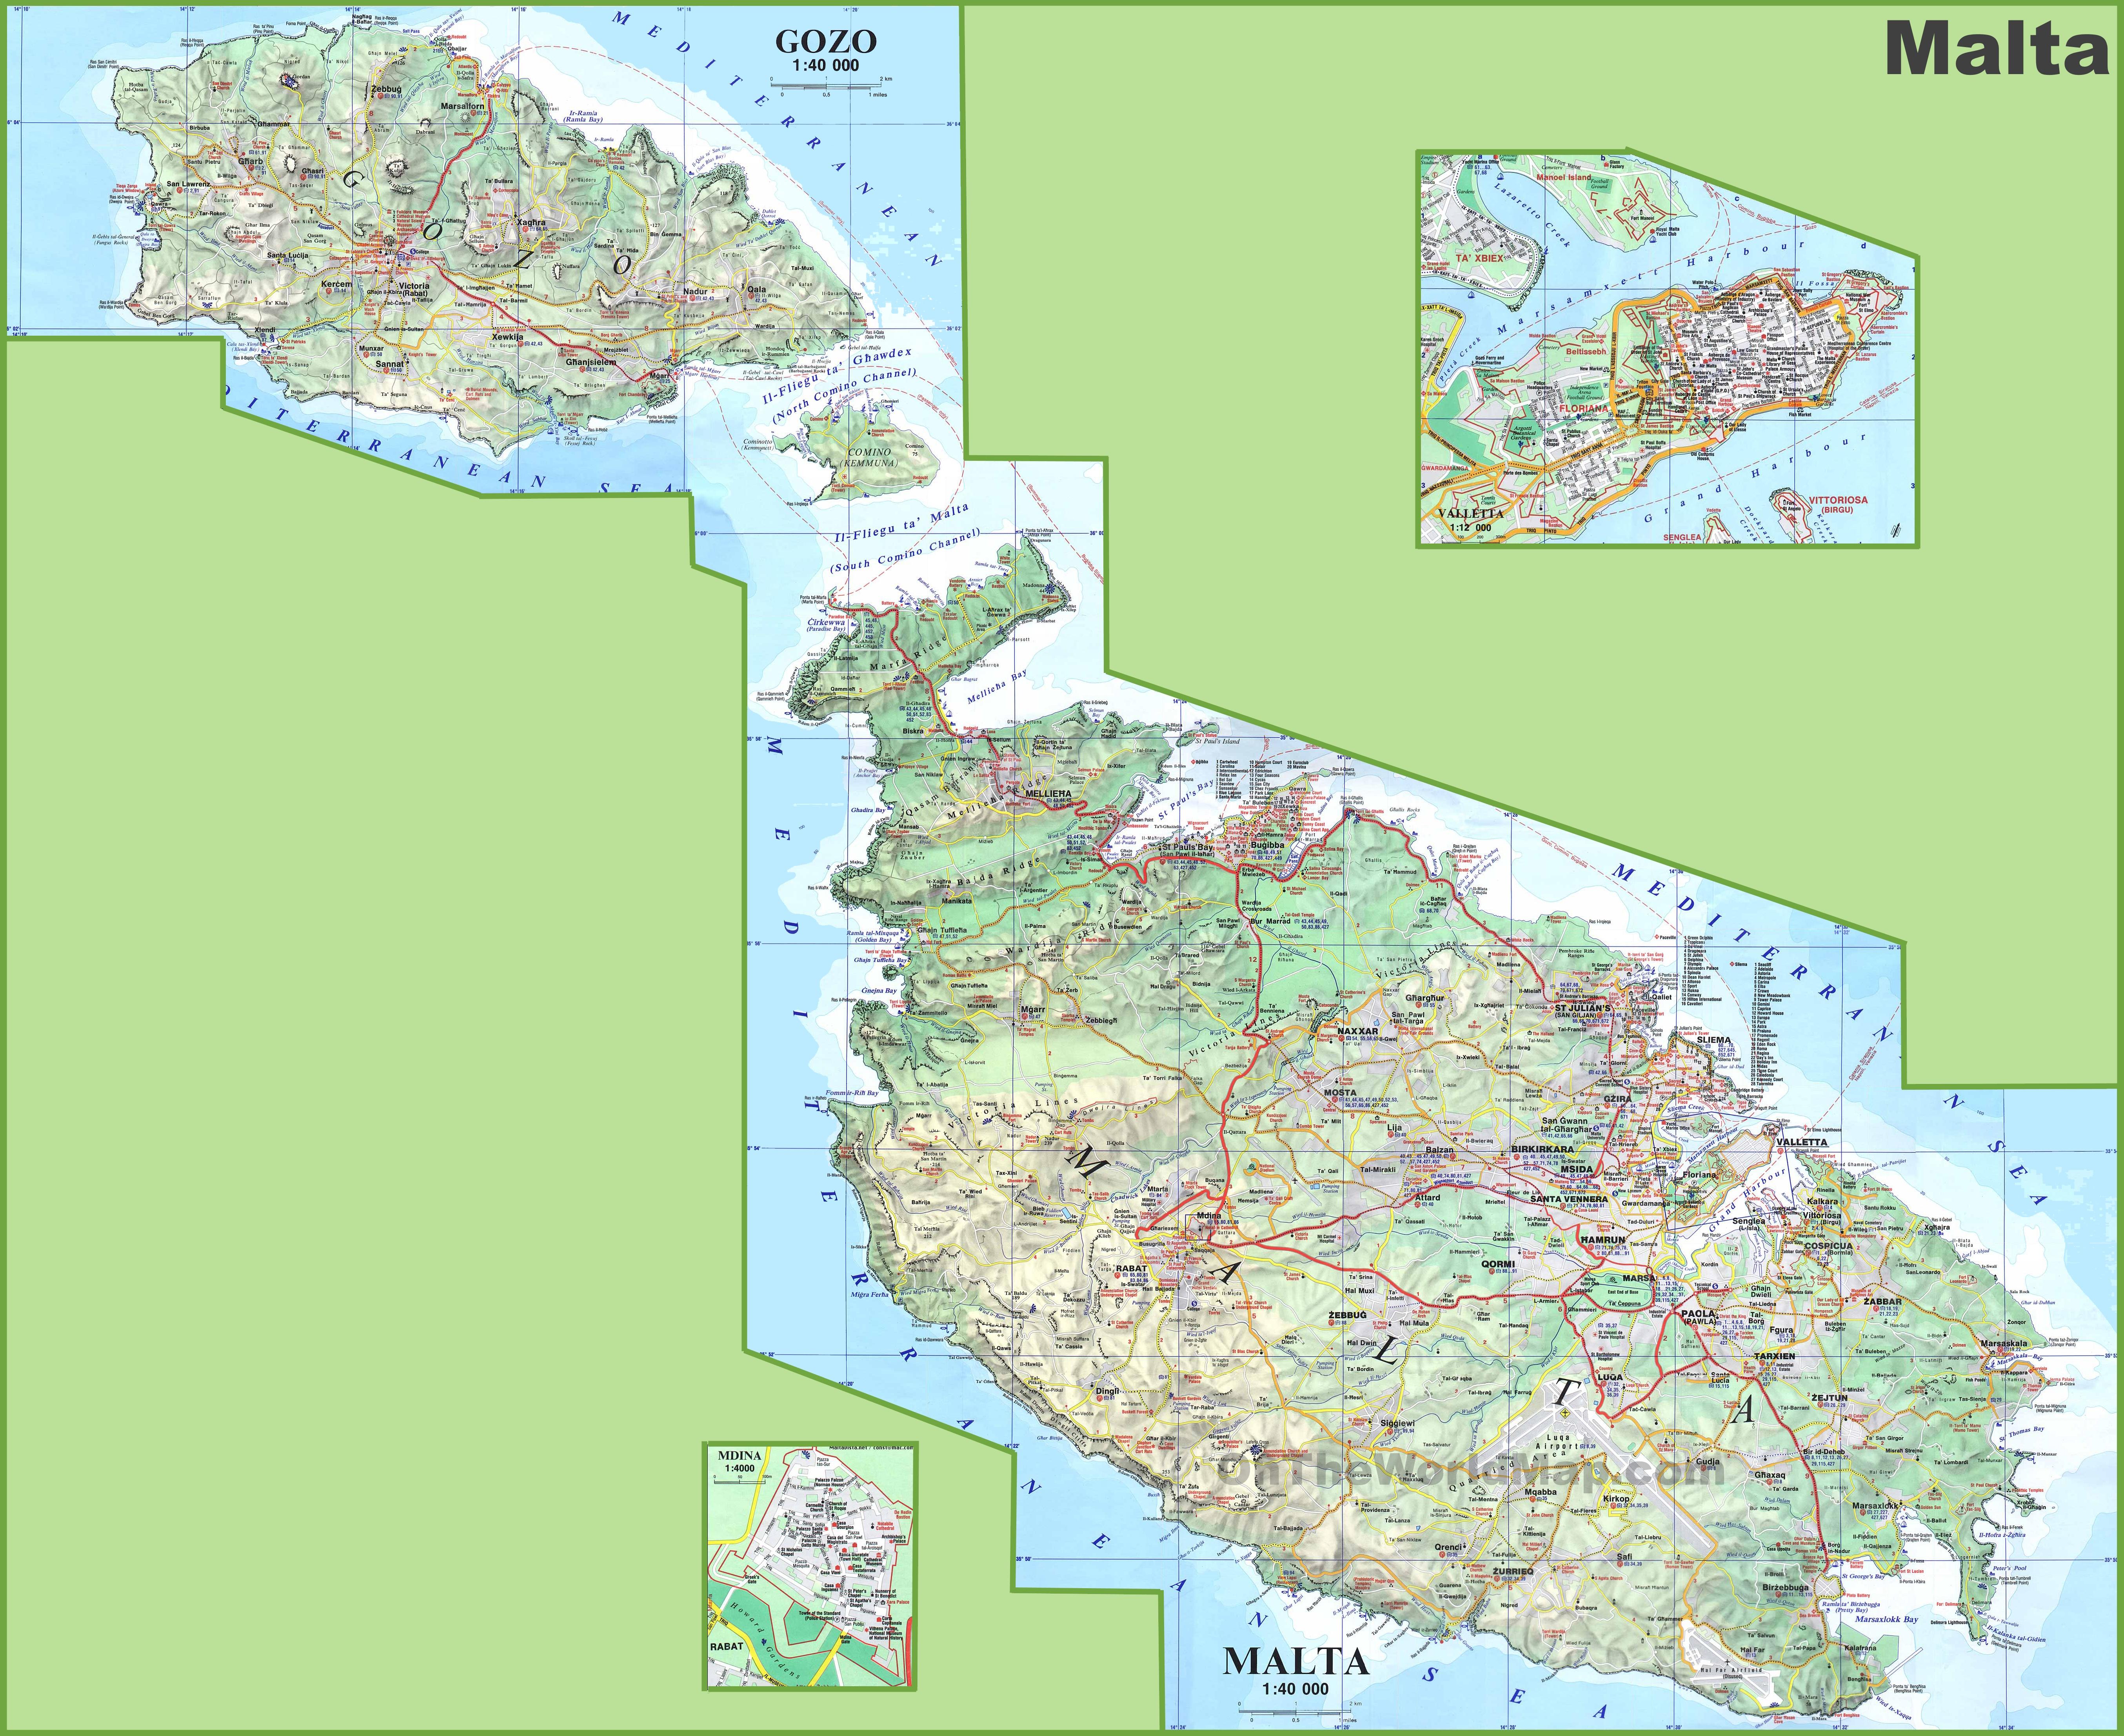 kort over malta